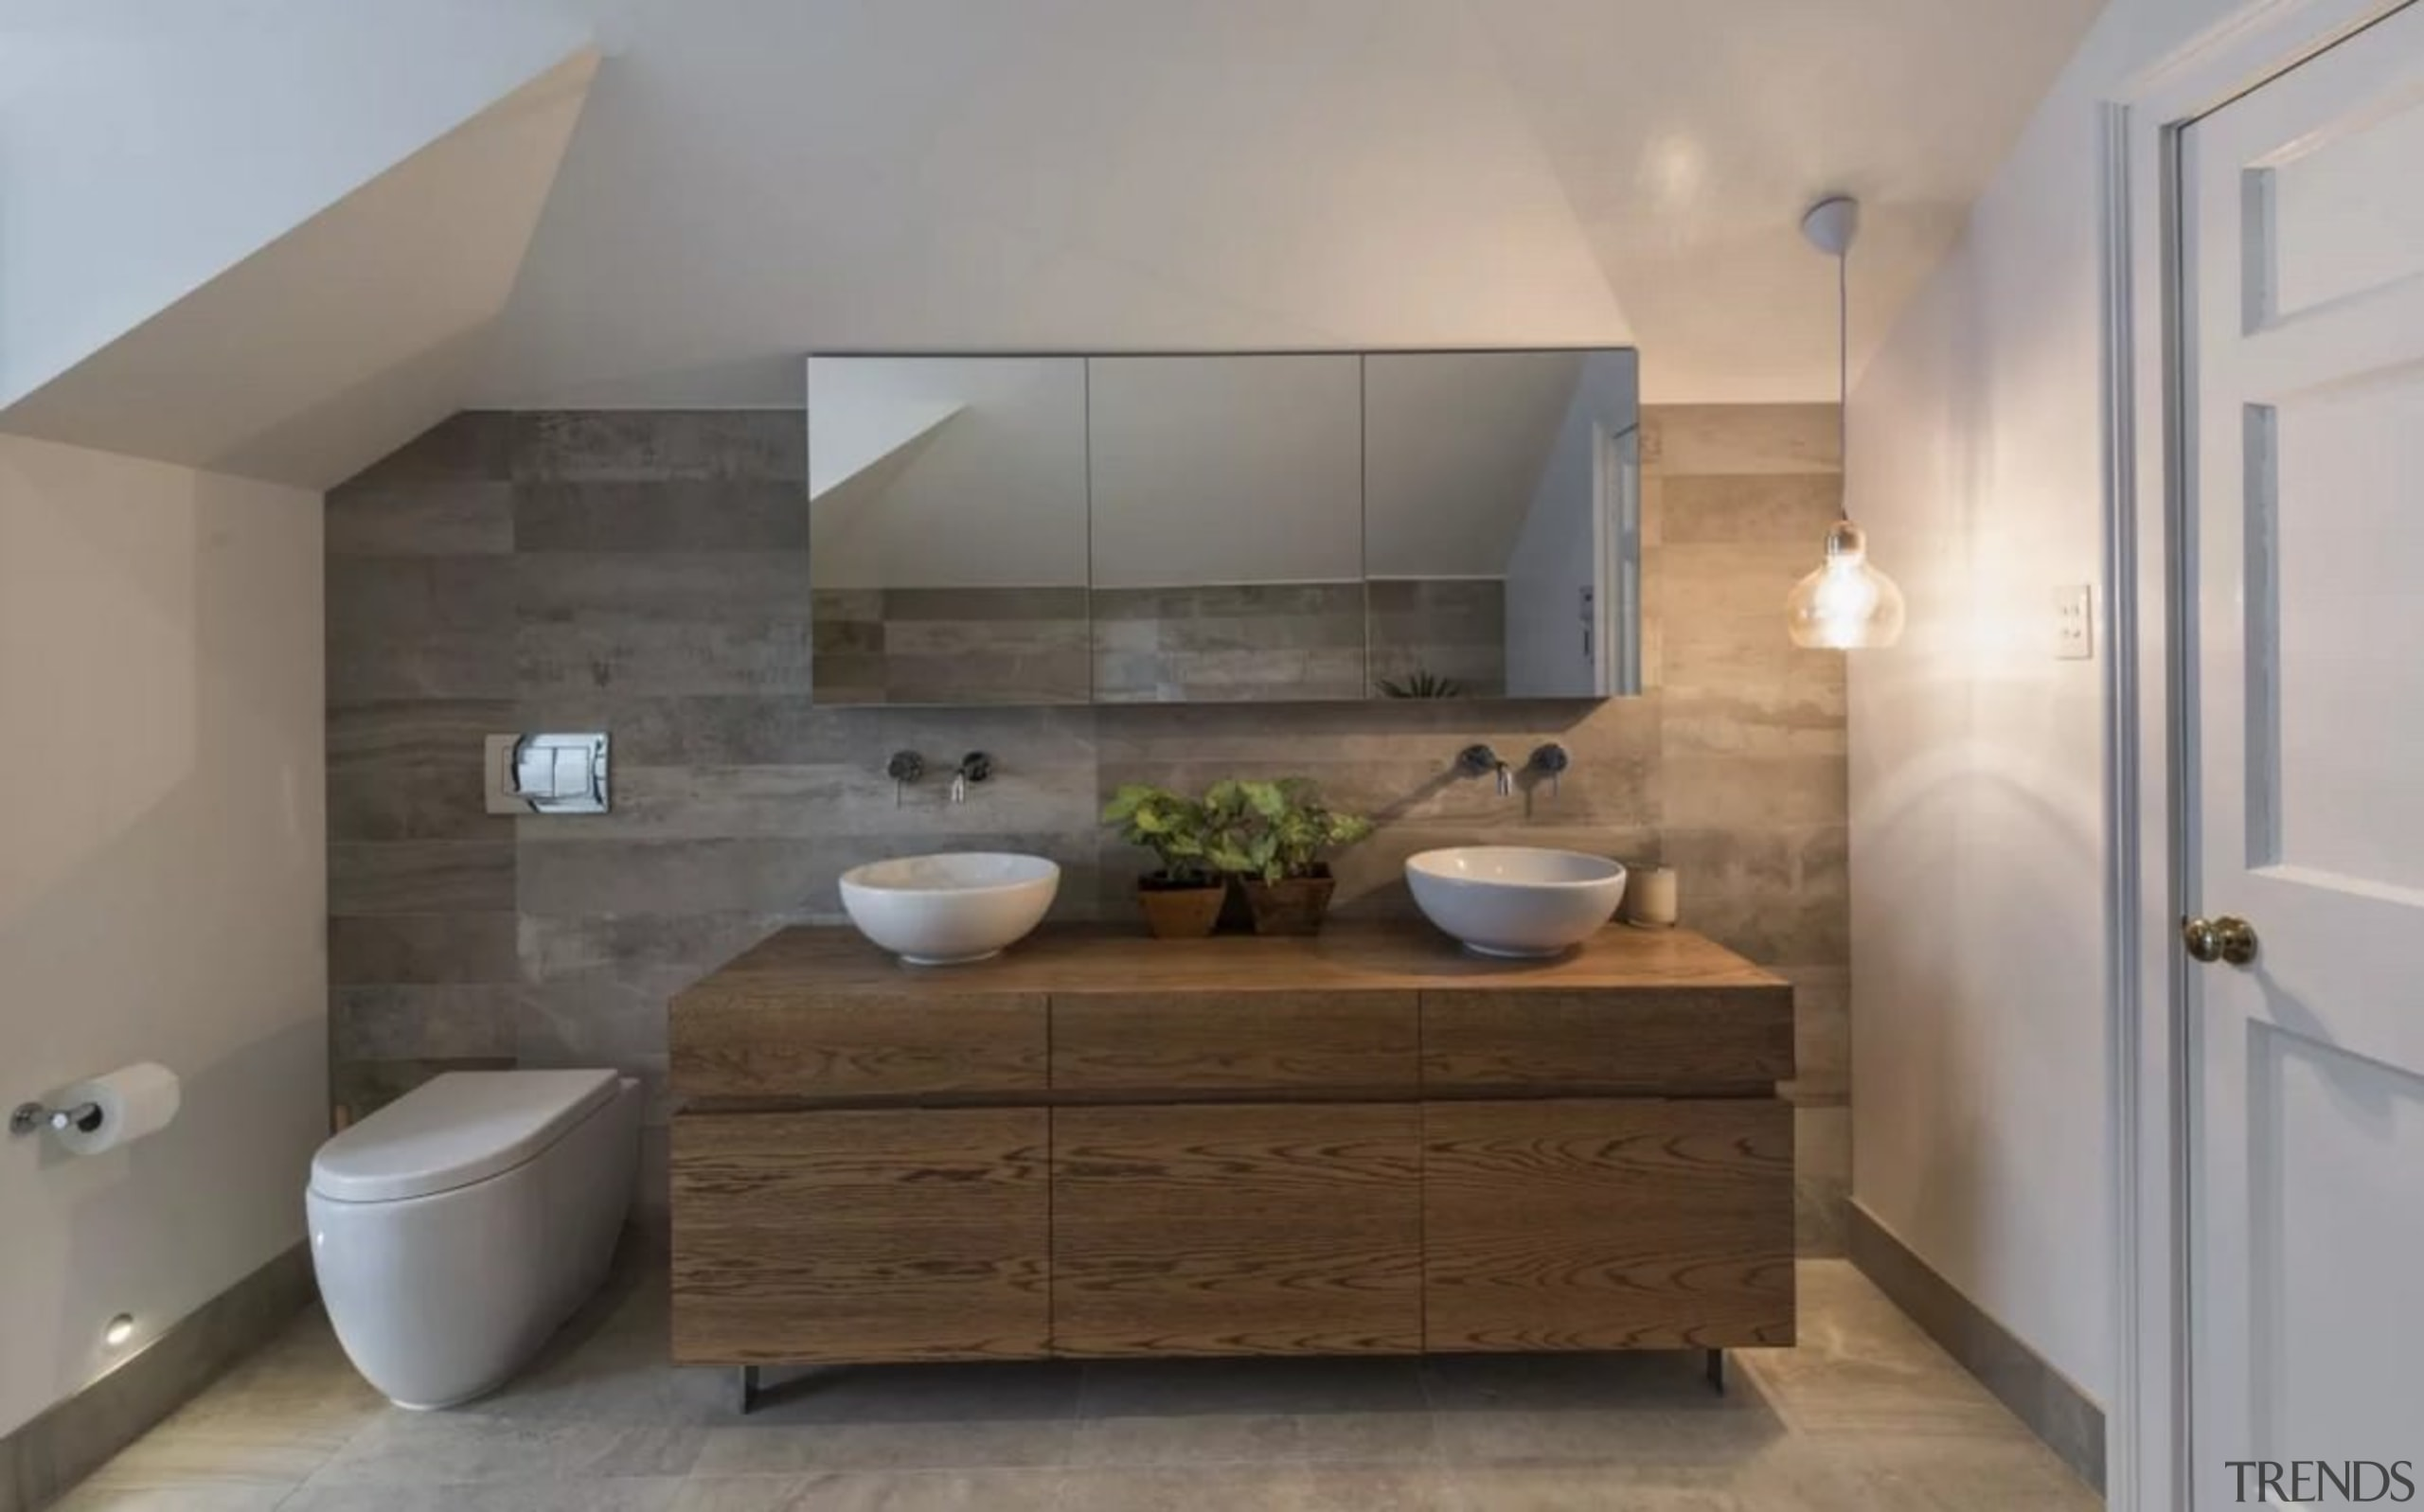 Floating vanities make bathrooms feel much larger - bathroom, bathroom accessory, bathroom cabinet, countertop, floor, home, interior design, room, sink, gray